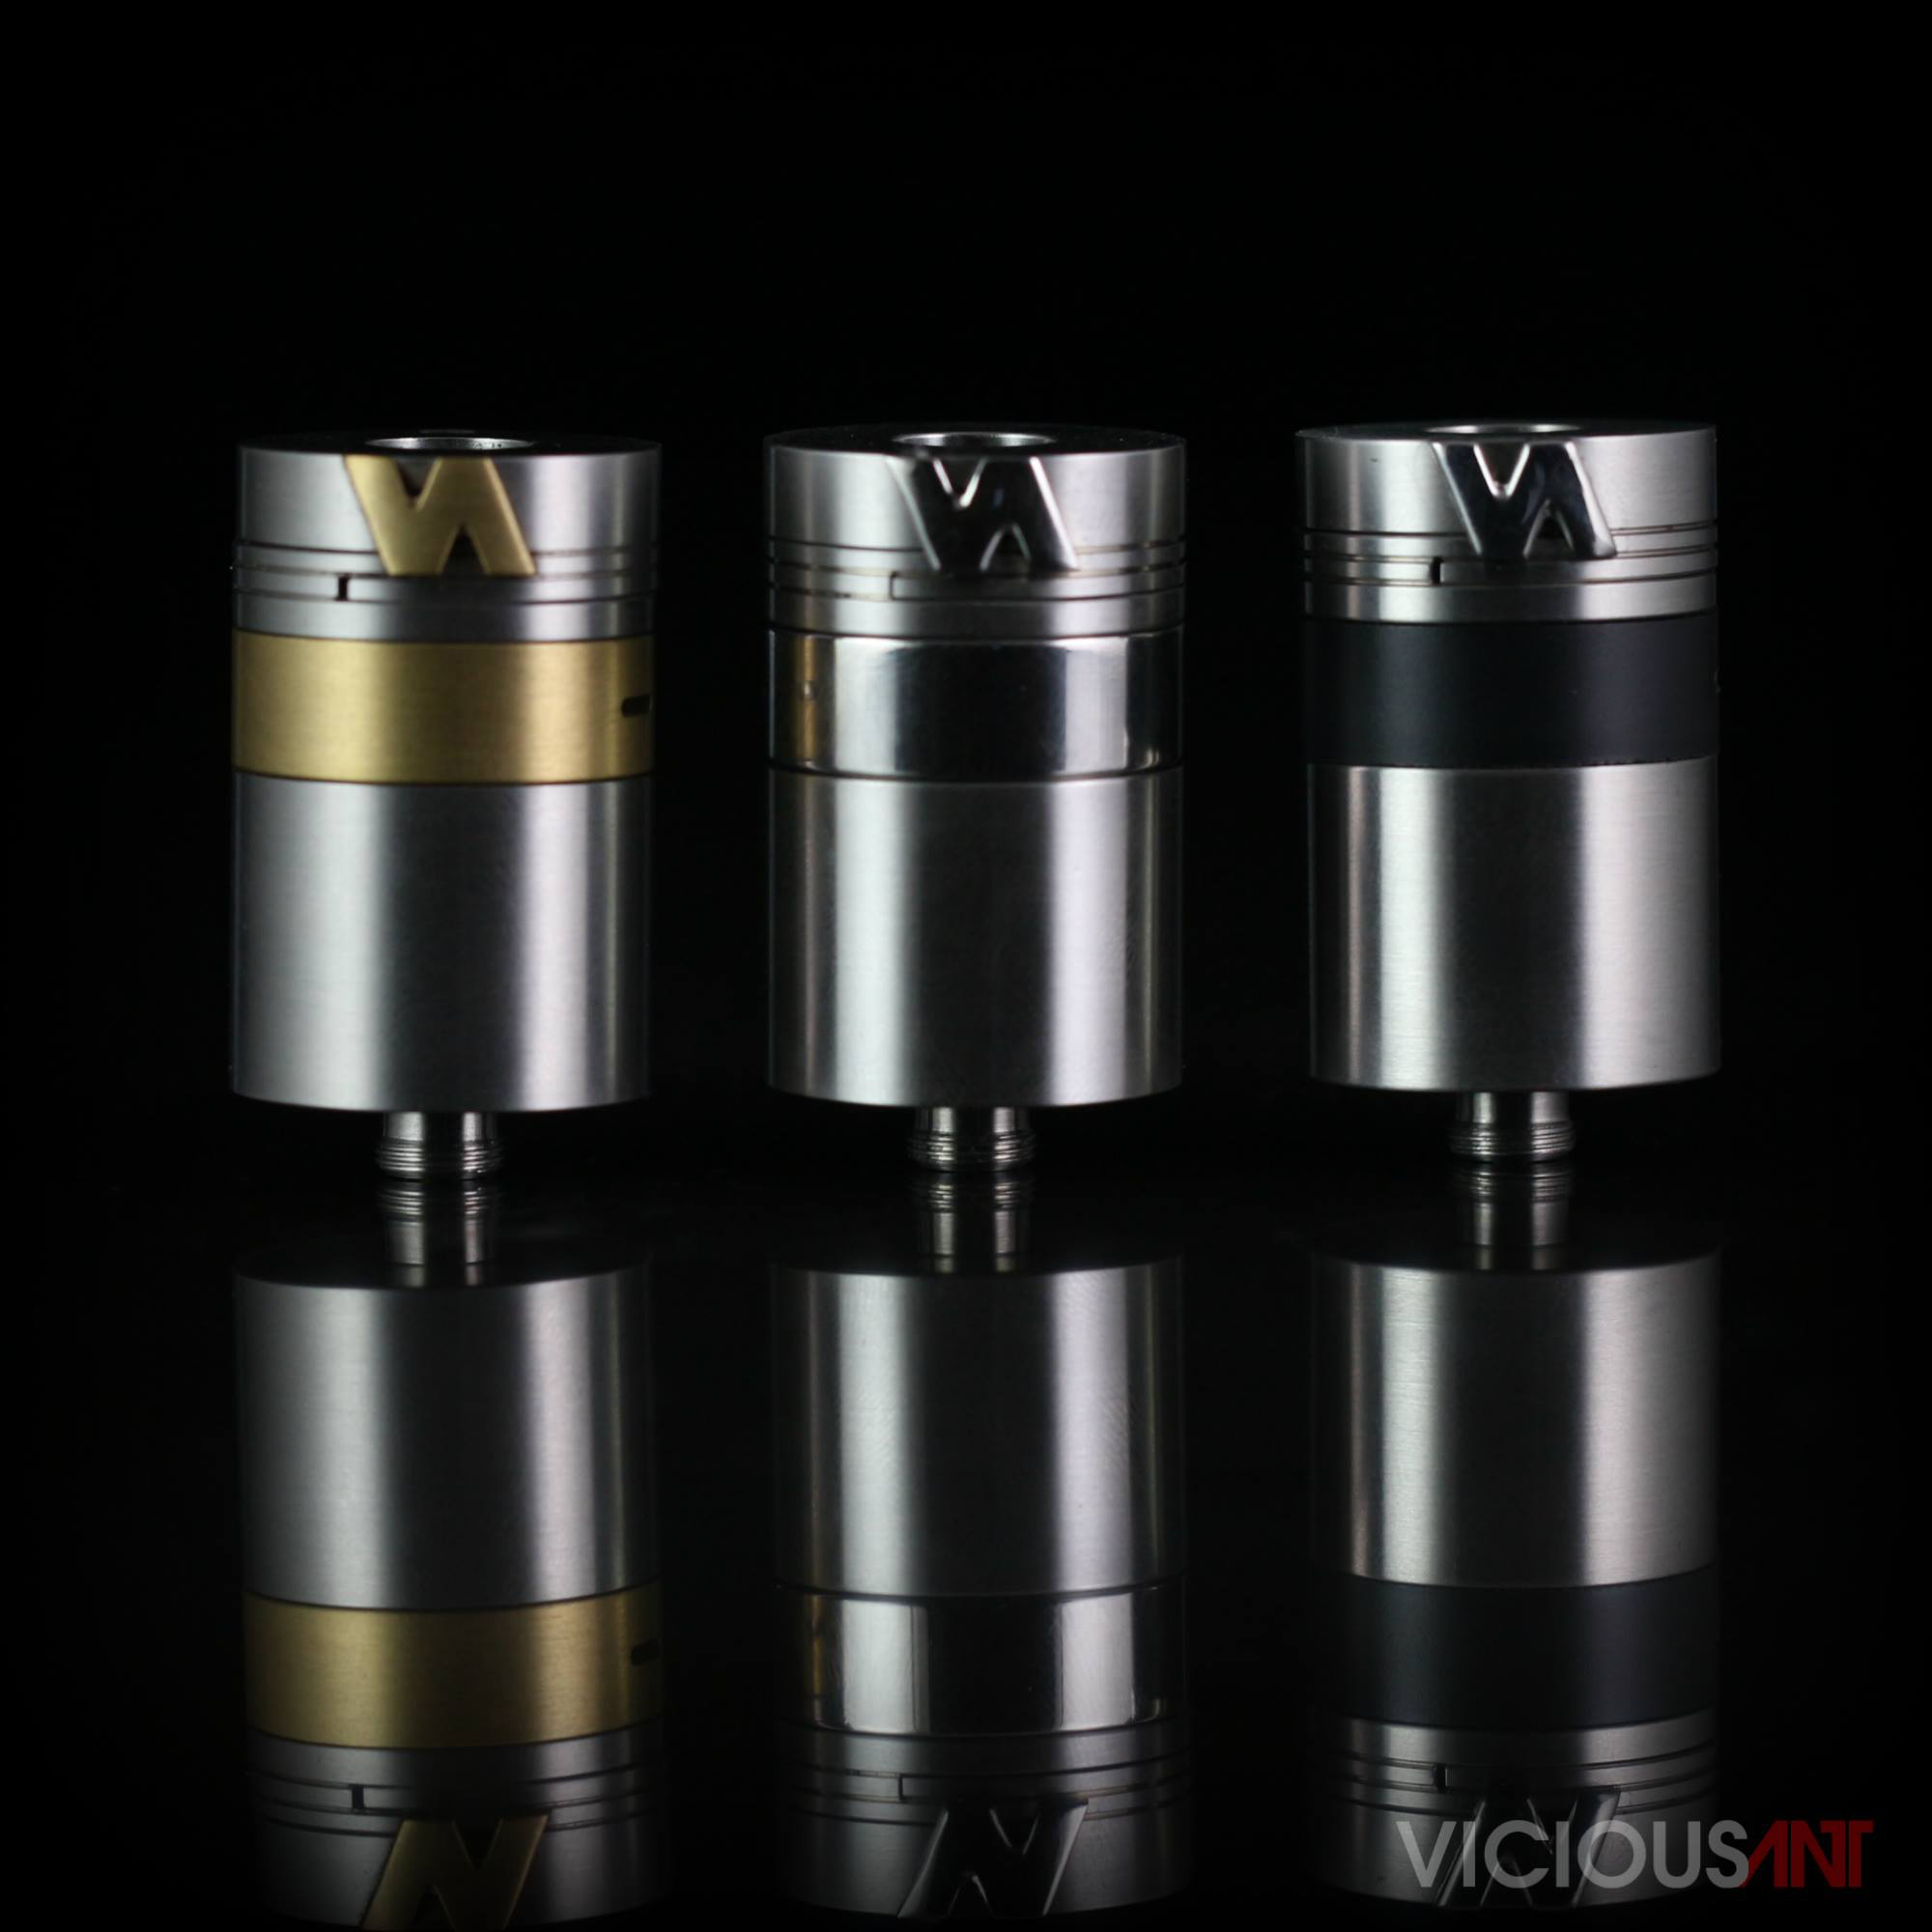 Vicious Ant | Prodigy 510